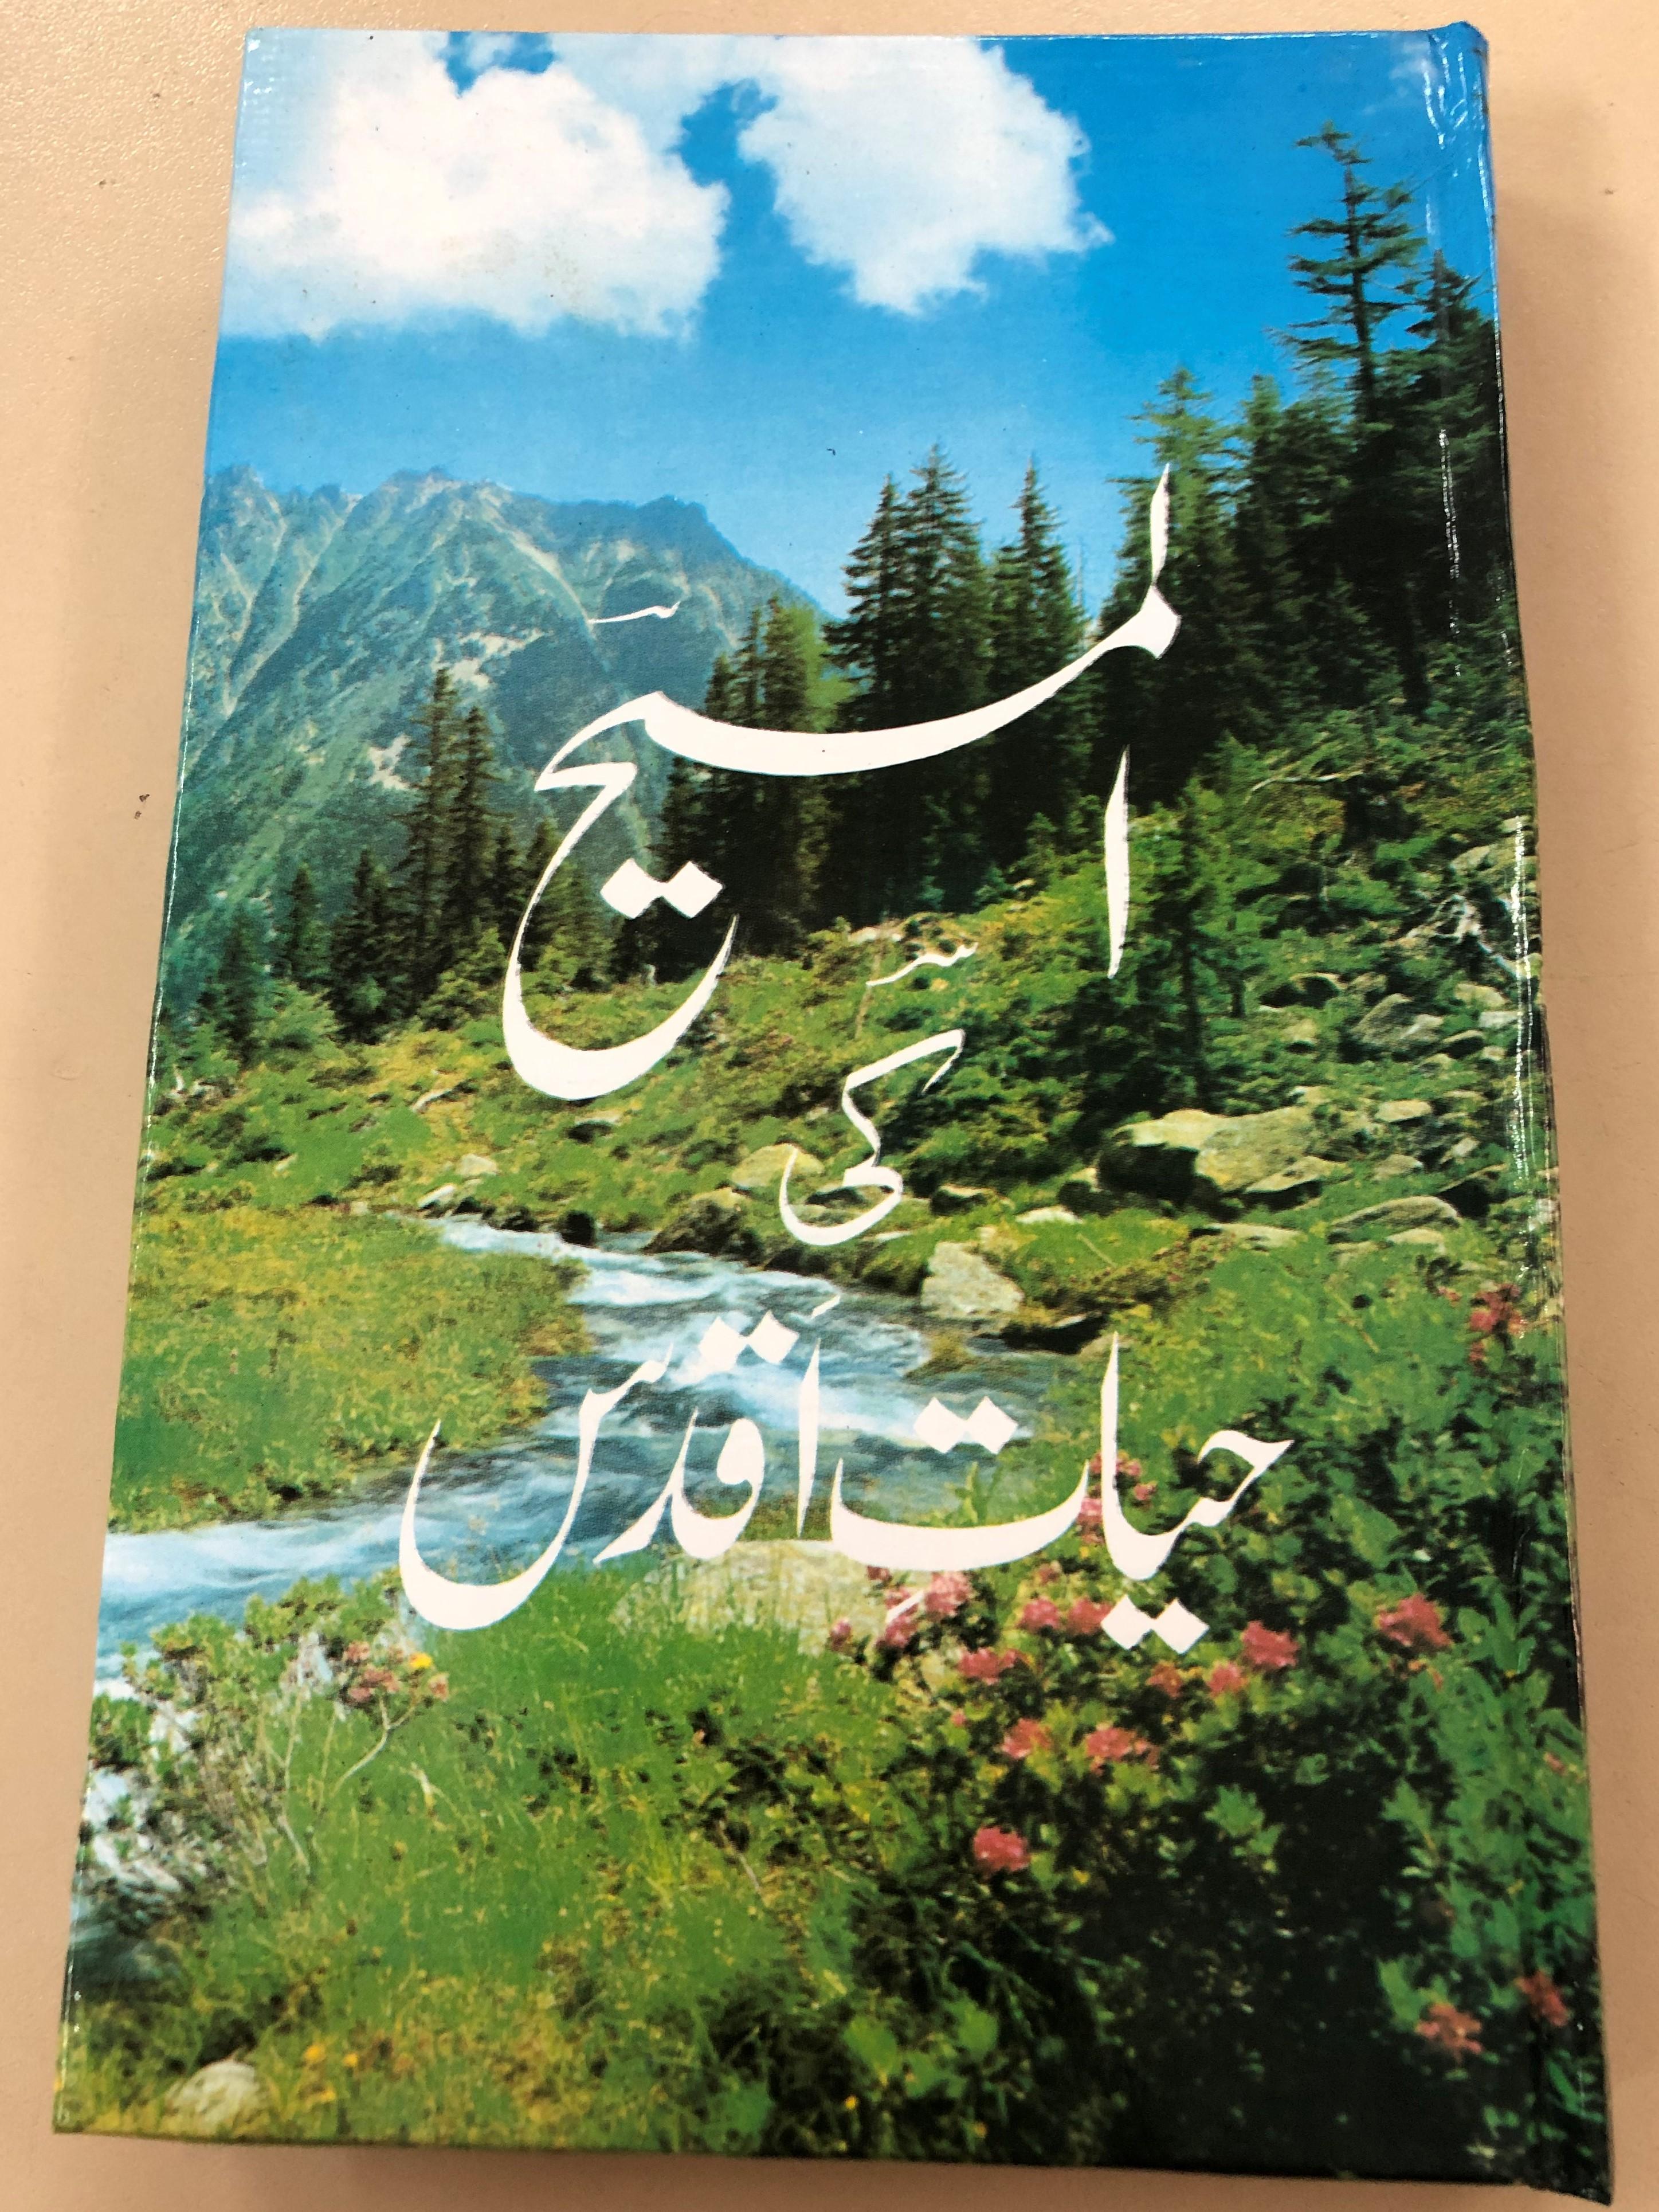 christ-the-conqueror-by-r.-becht-in-urdu-language-hardcover-2014-masihi-isha-at-khana-1-.jpg